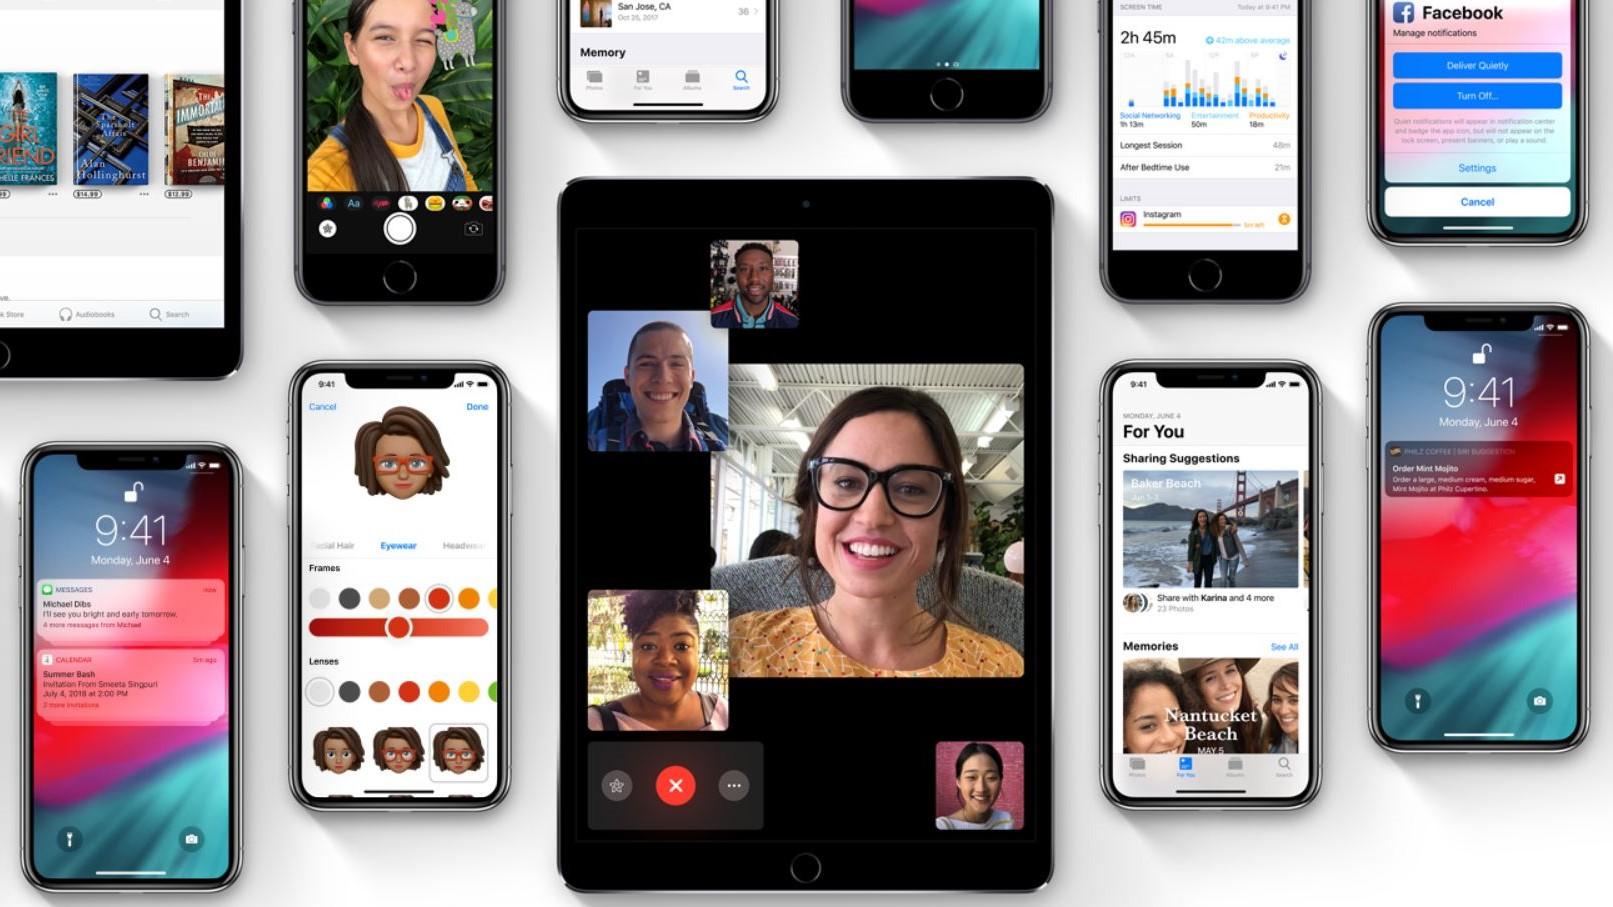 iOS 12 er allerede større enn iOS 11.